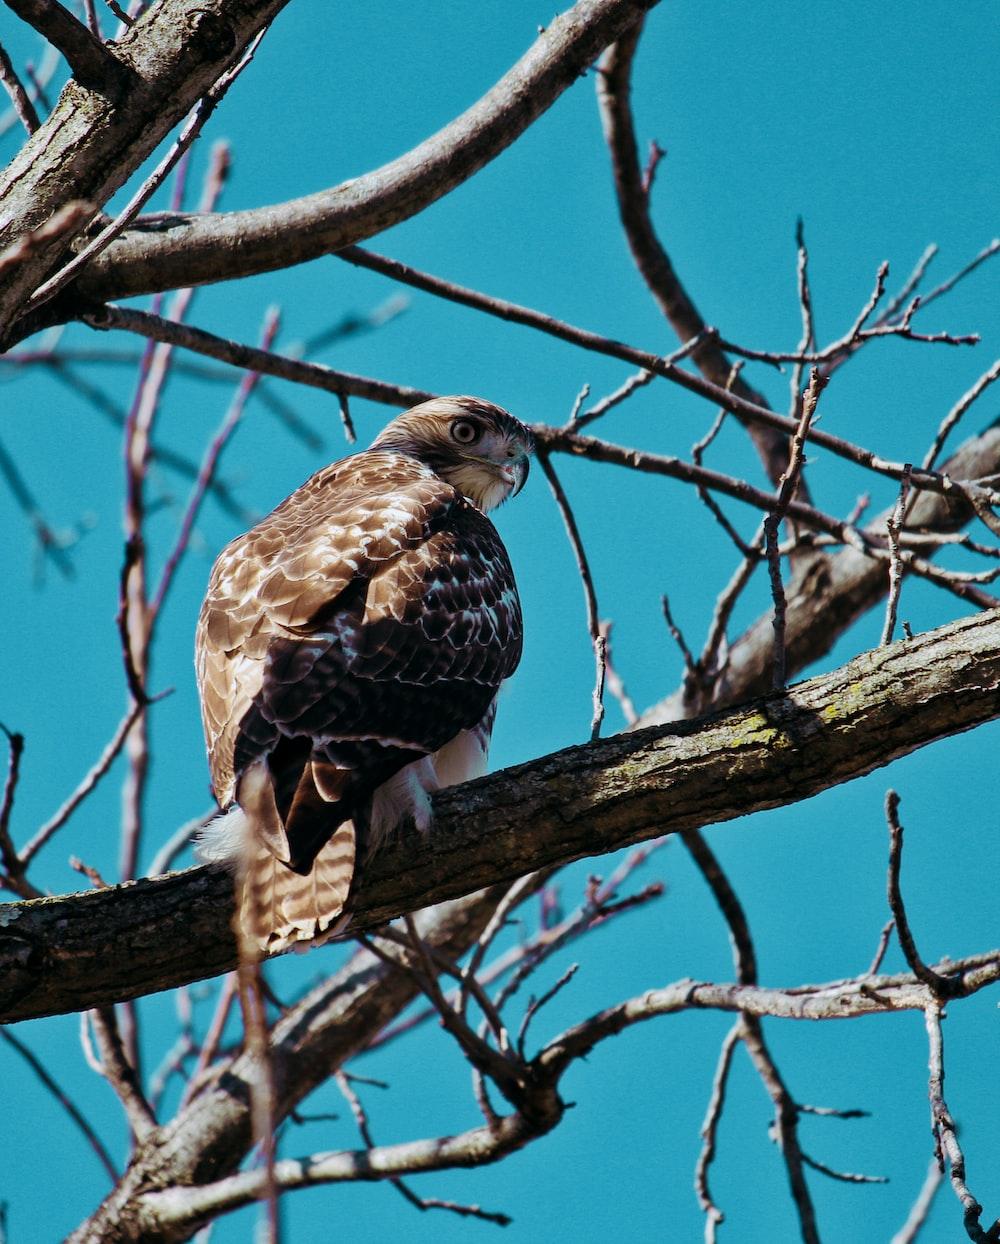 brown owl perching on tree